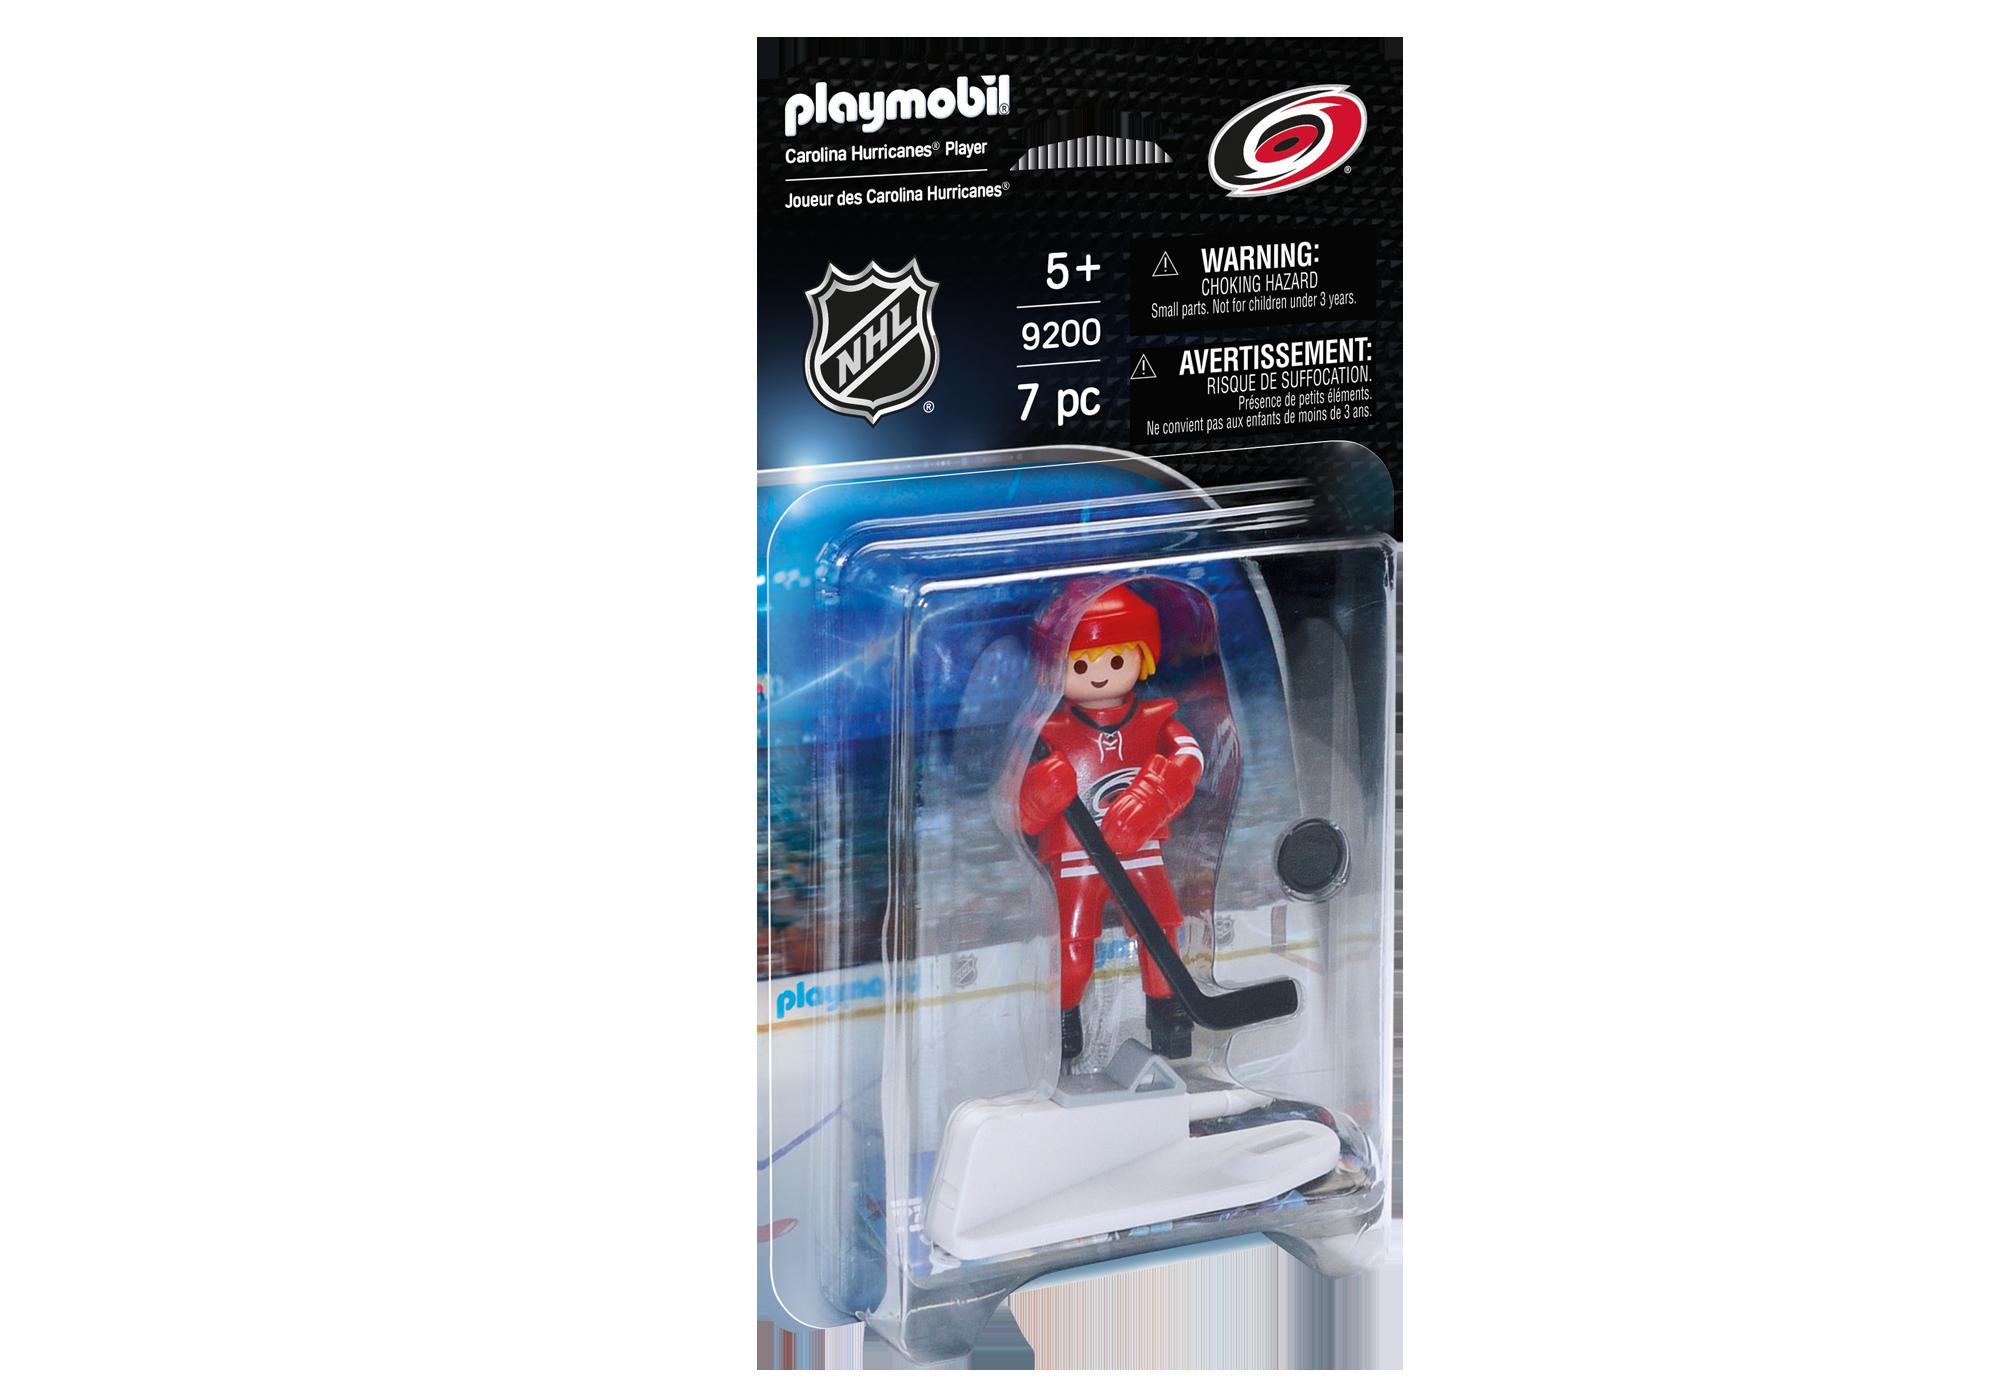 http://media.playmobil.com/i/playmobil/9200_product_box_front/NHL® Carolina Hurricanes® Player